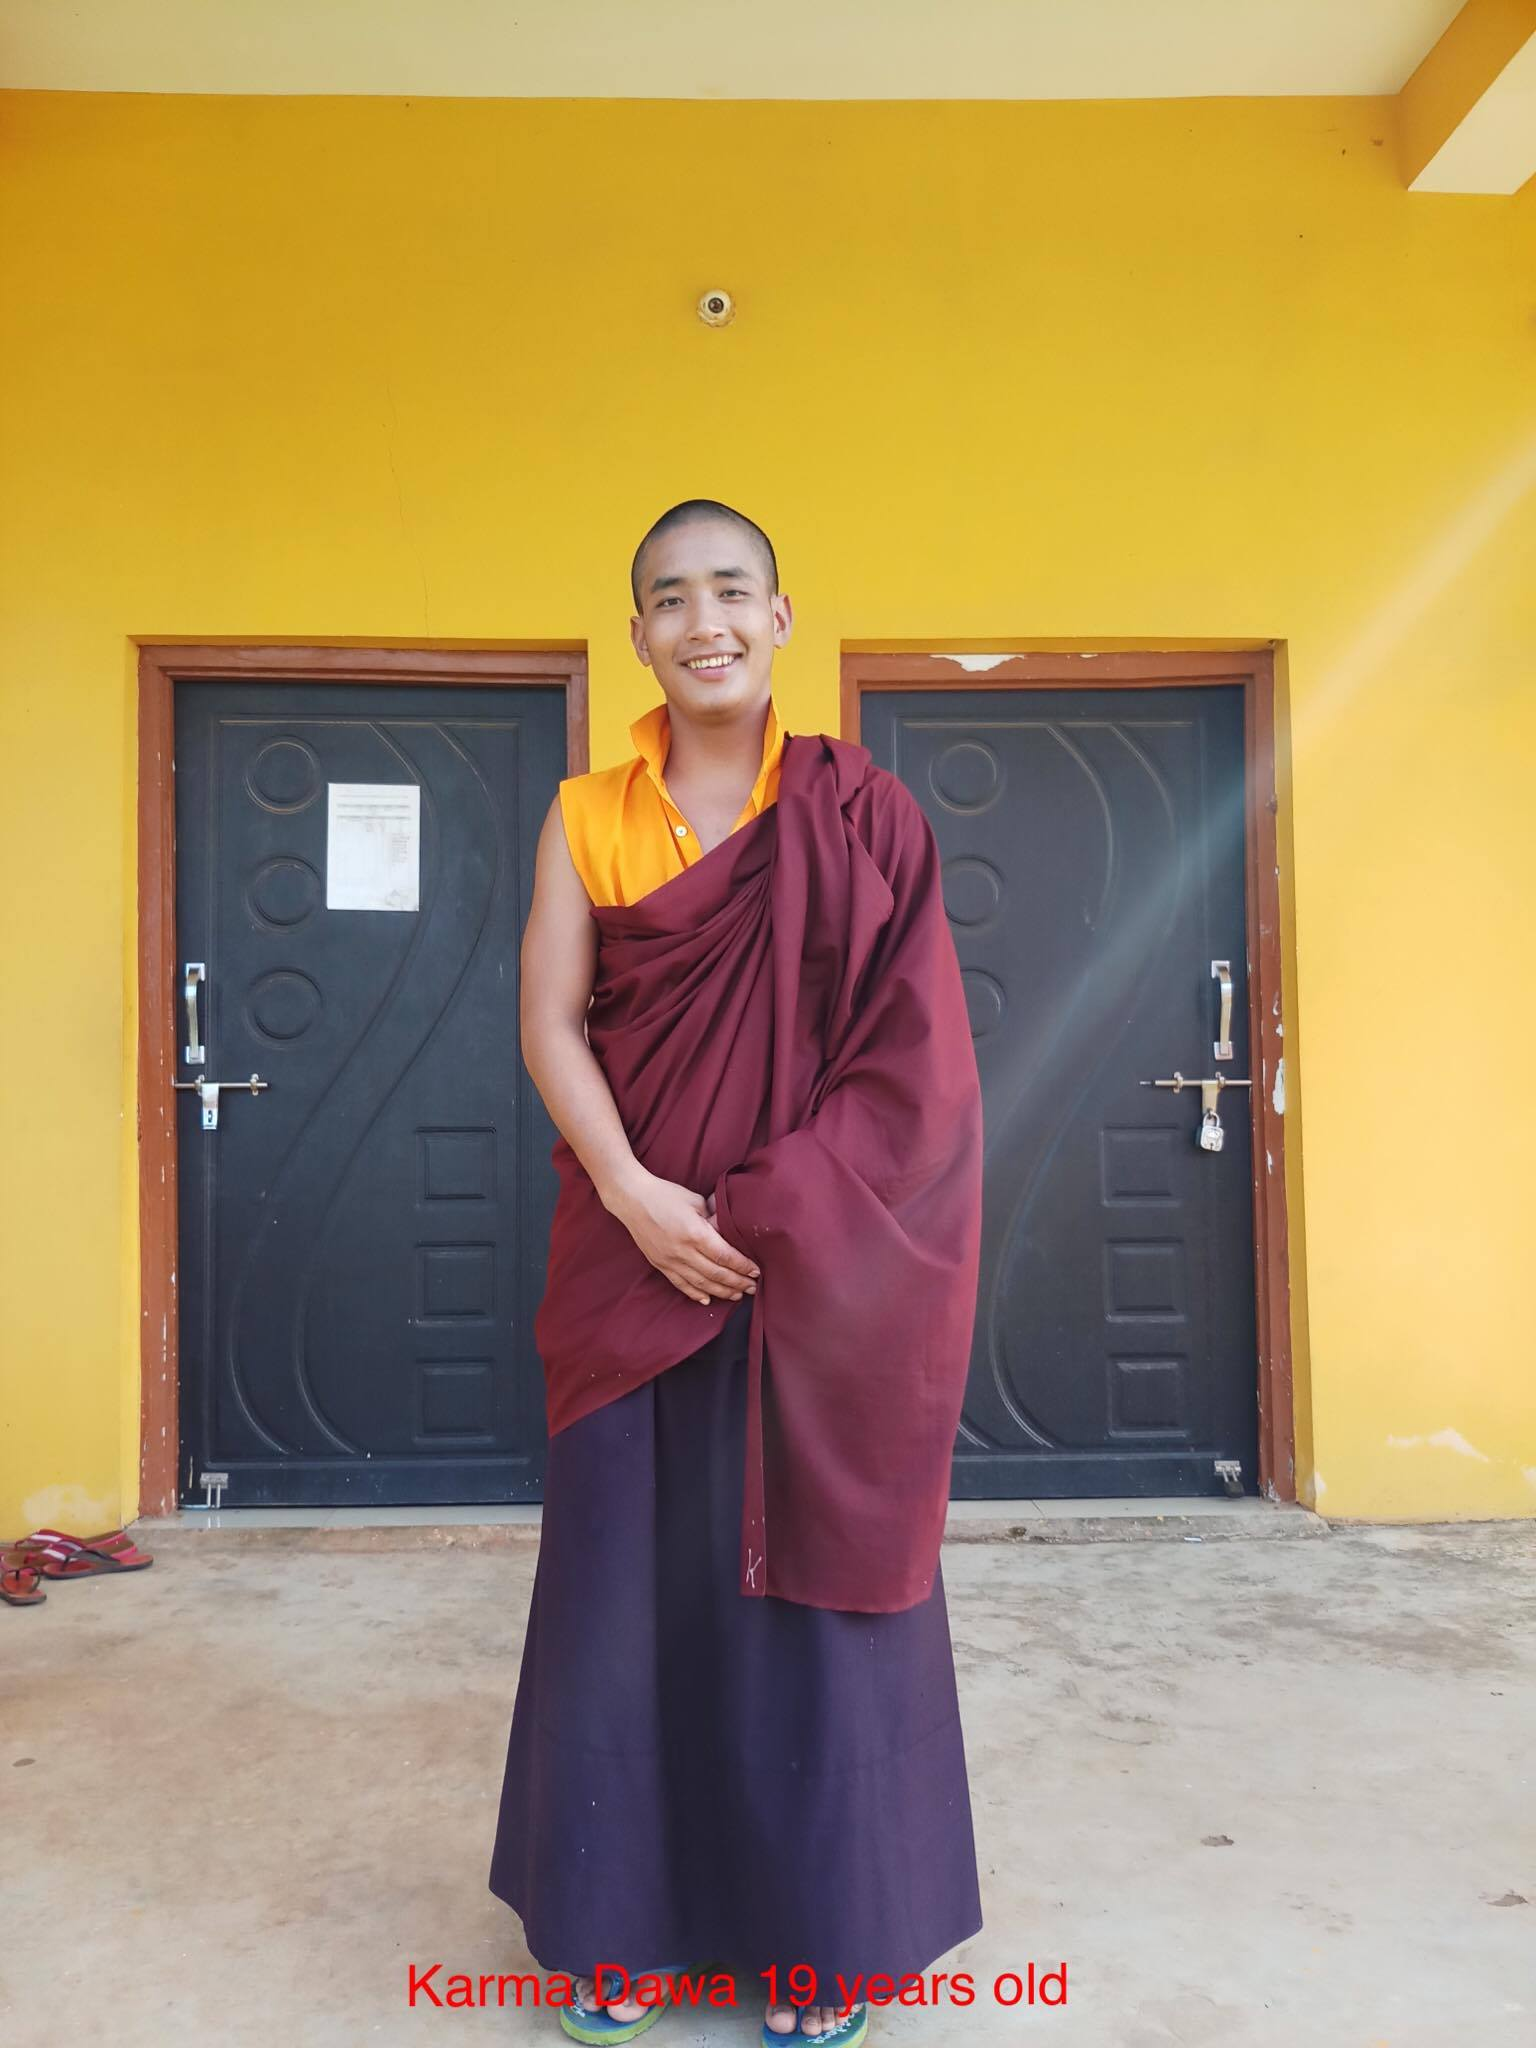 Monk_Karma_Dawa_19yrs_old.jpg